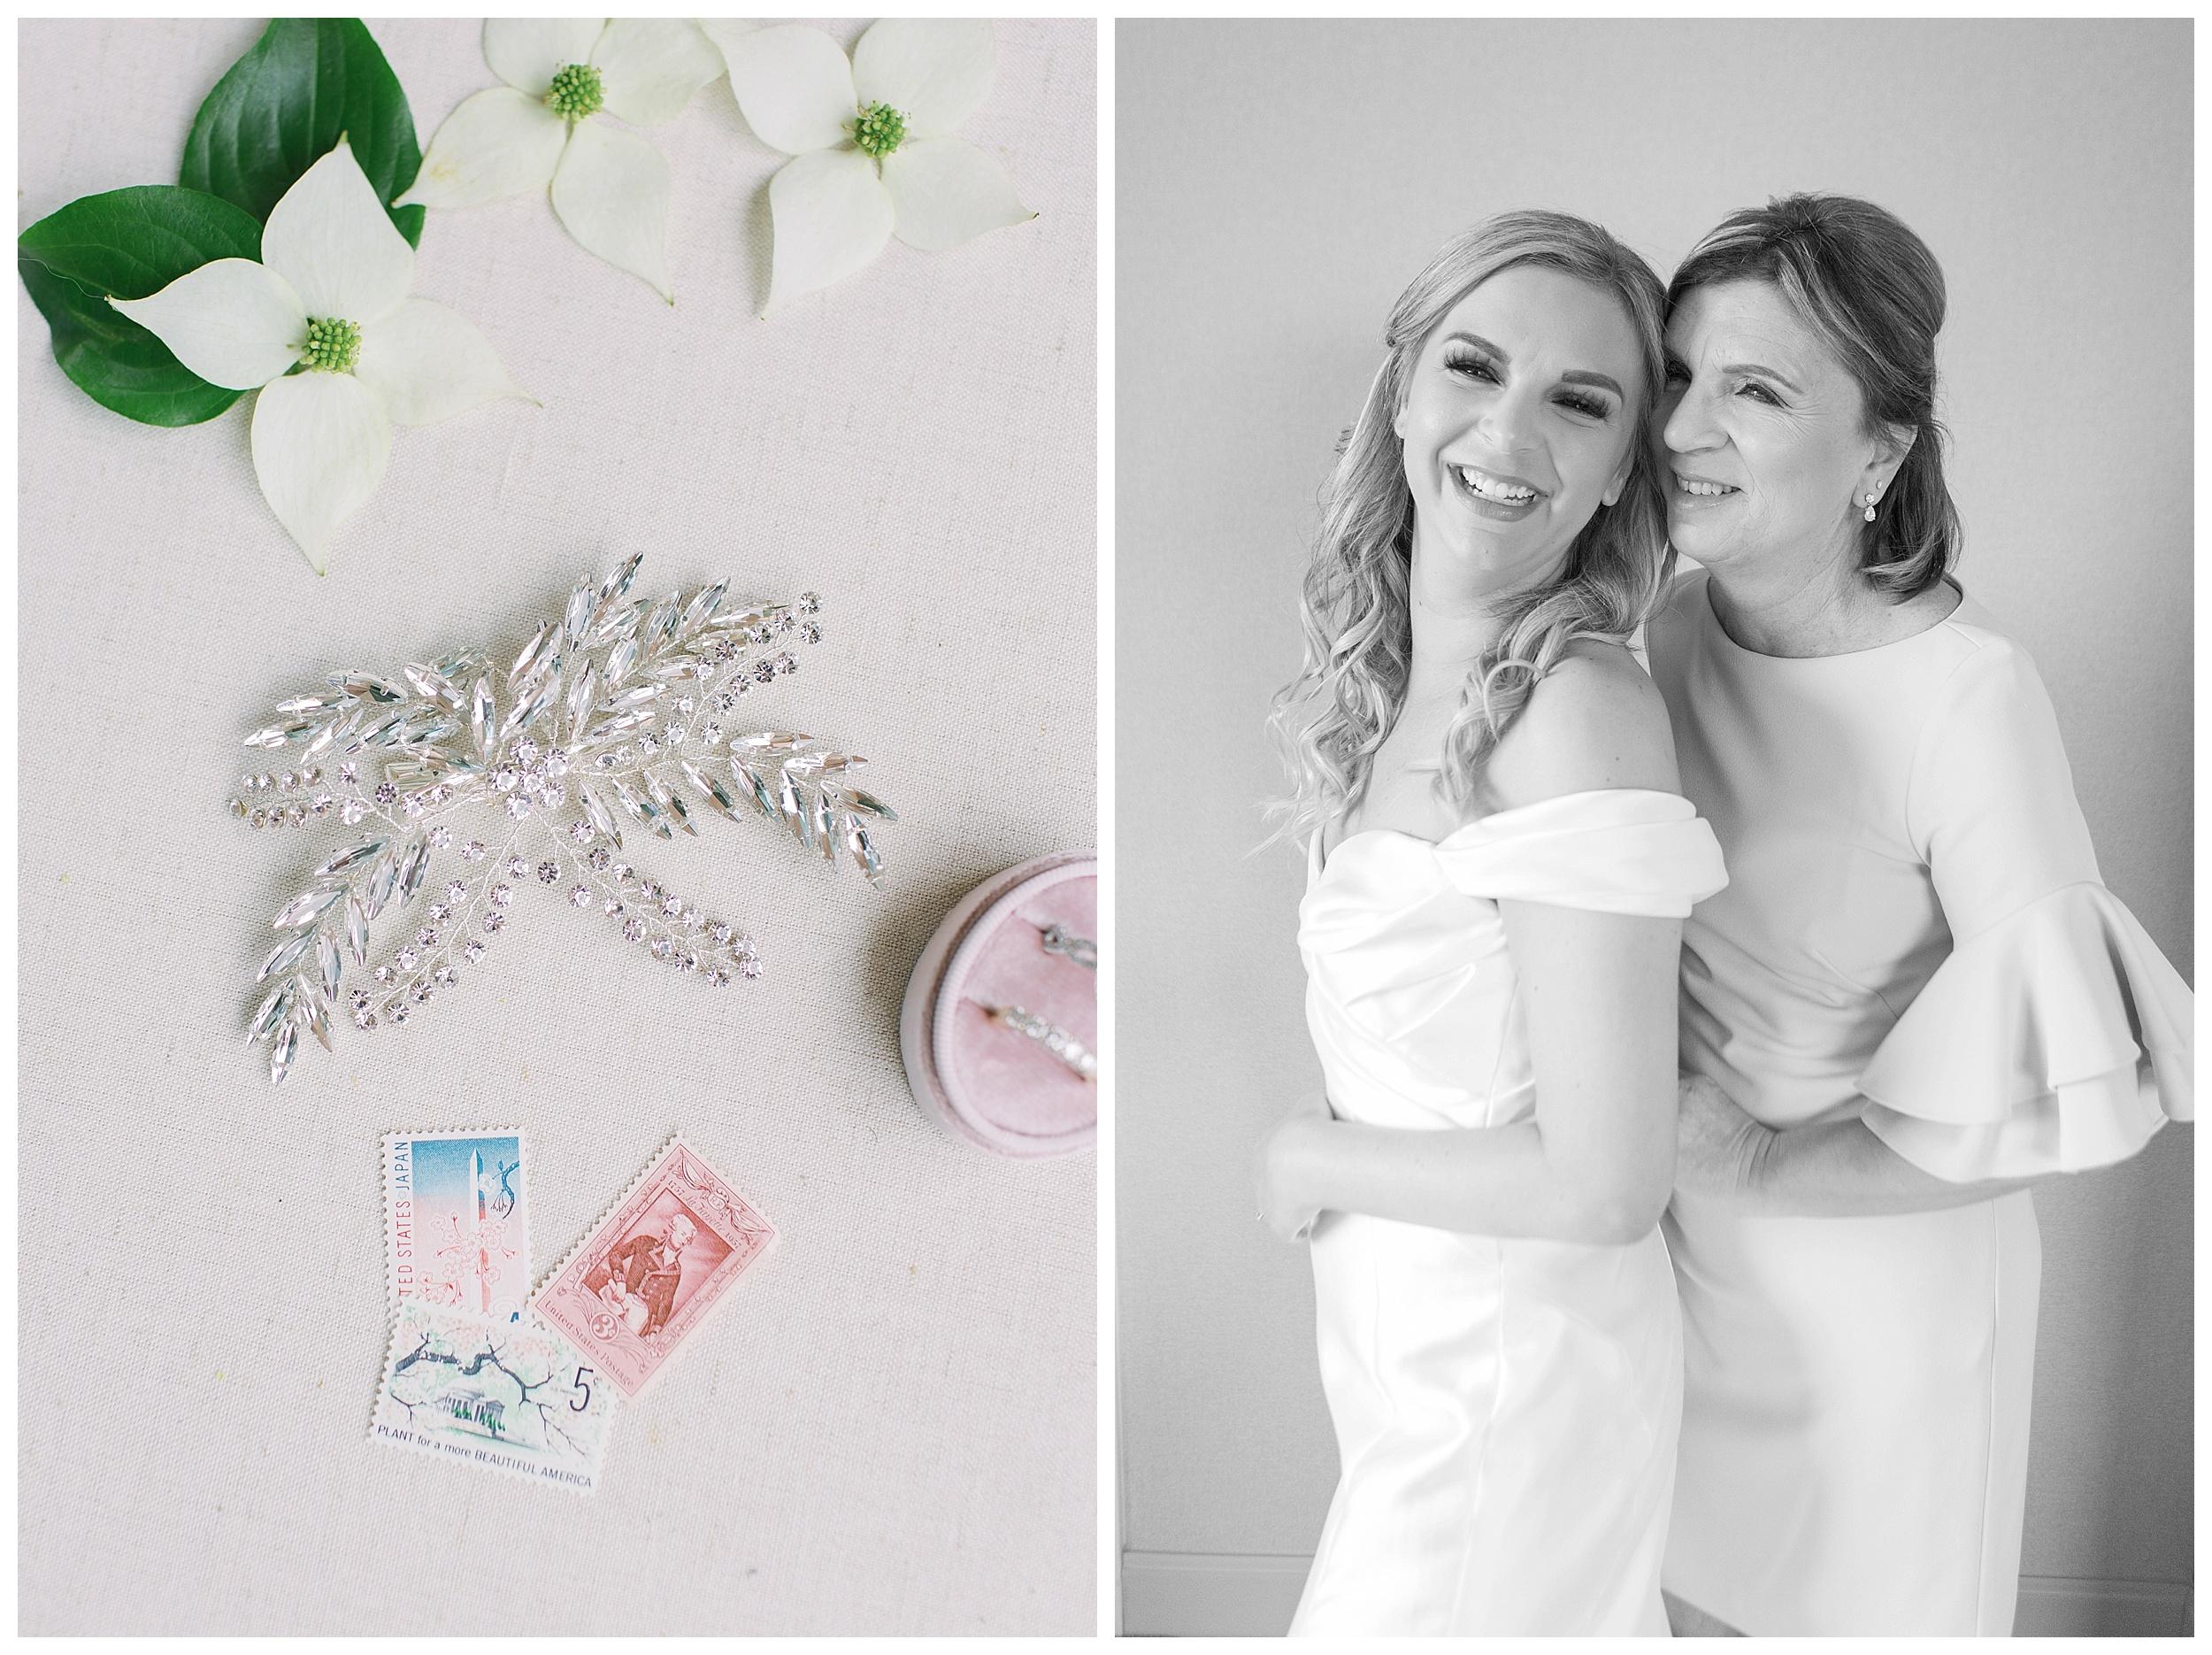 Lansdowne Resort Wedding | Virginia Film Wedding Photographer Kir Tuben_0010.jpg